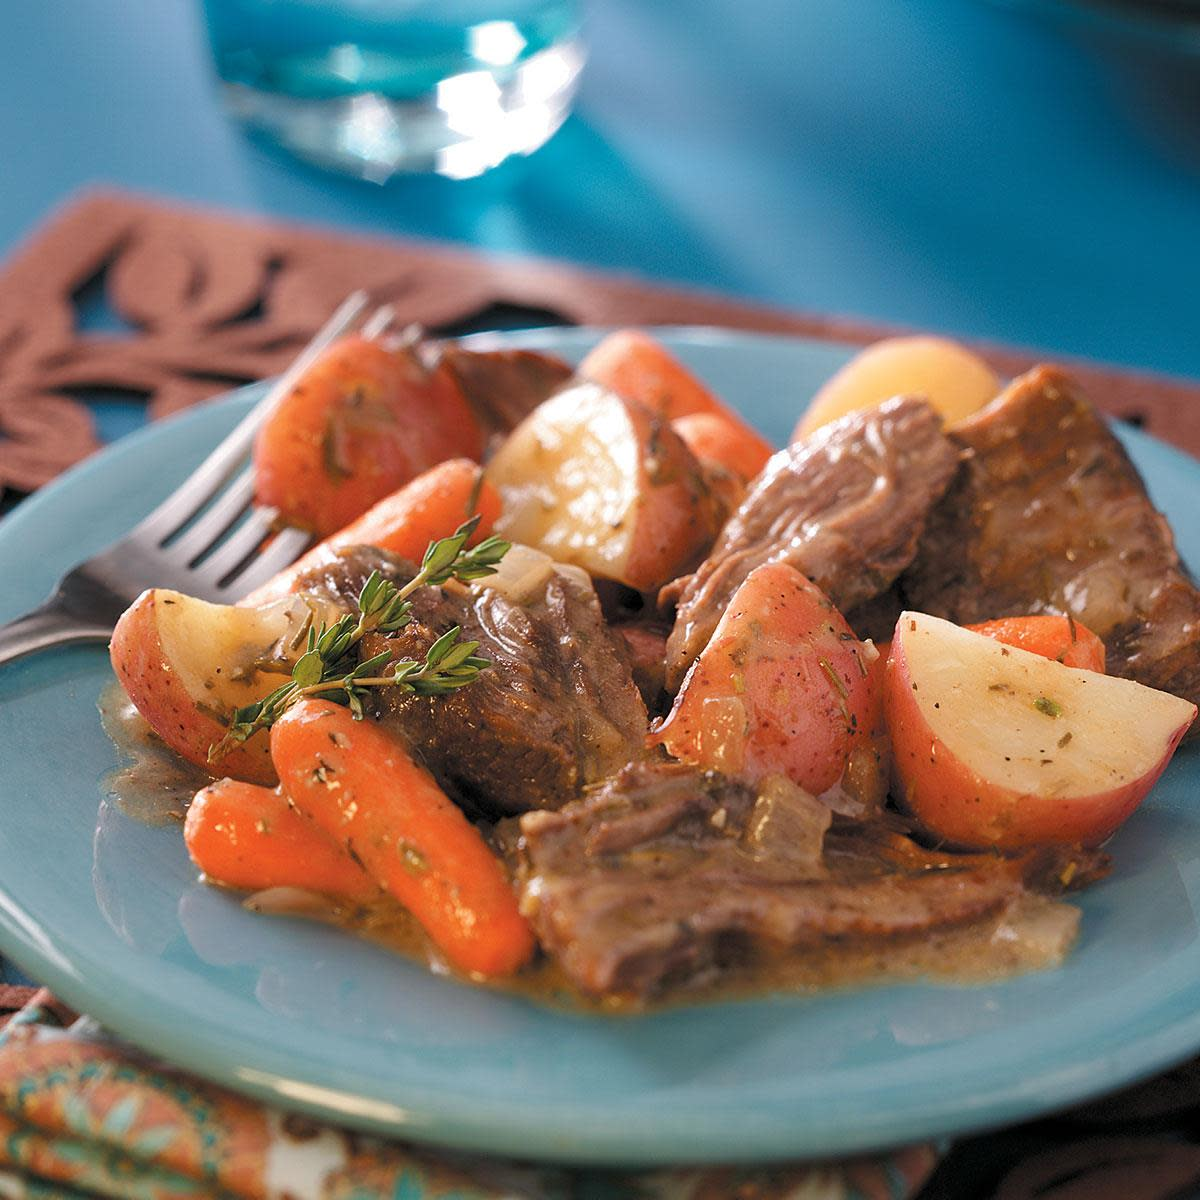 An impressive pot roast dinner.